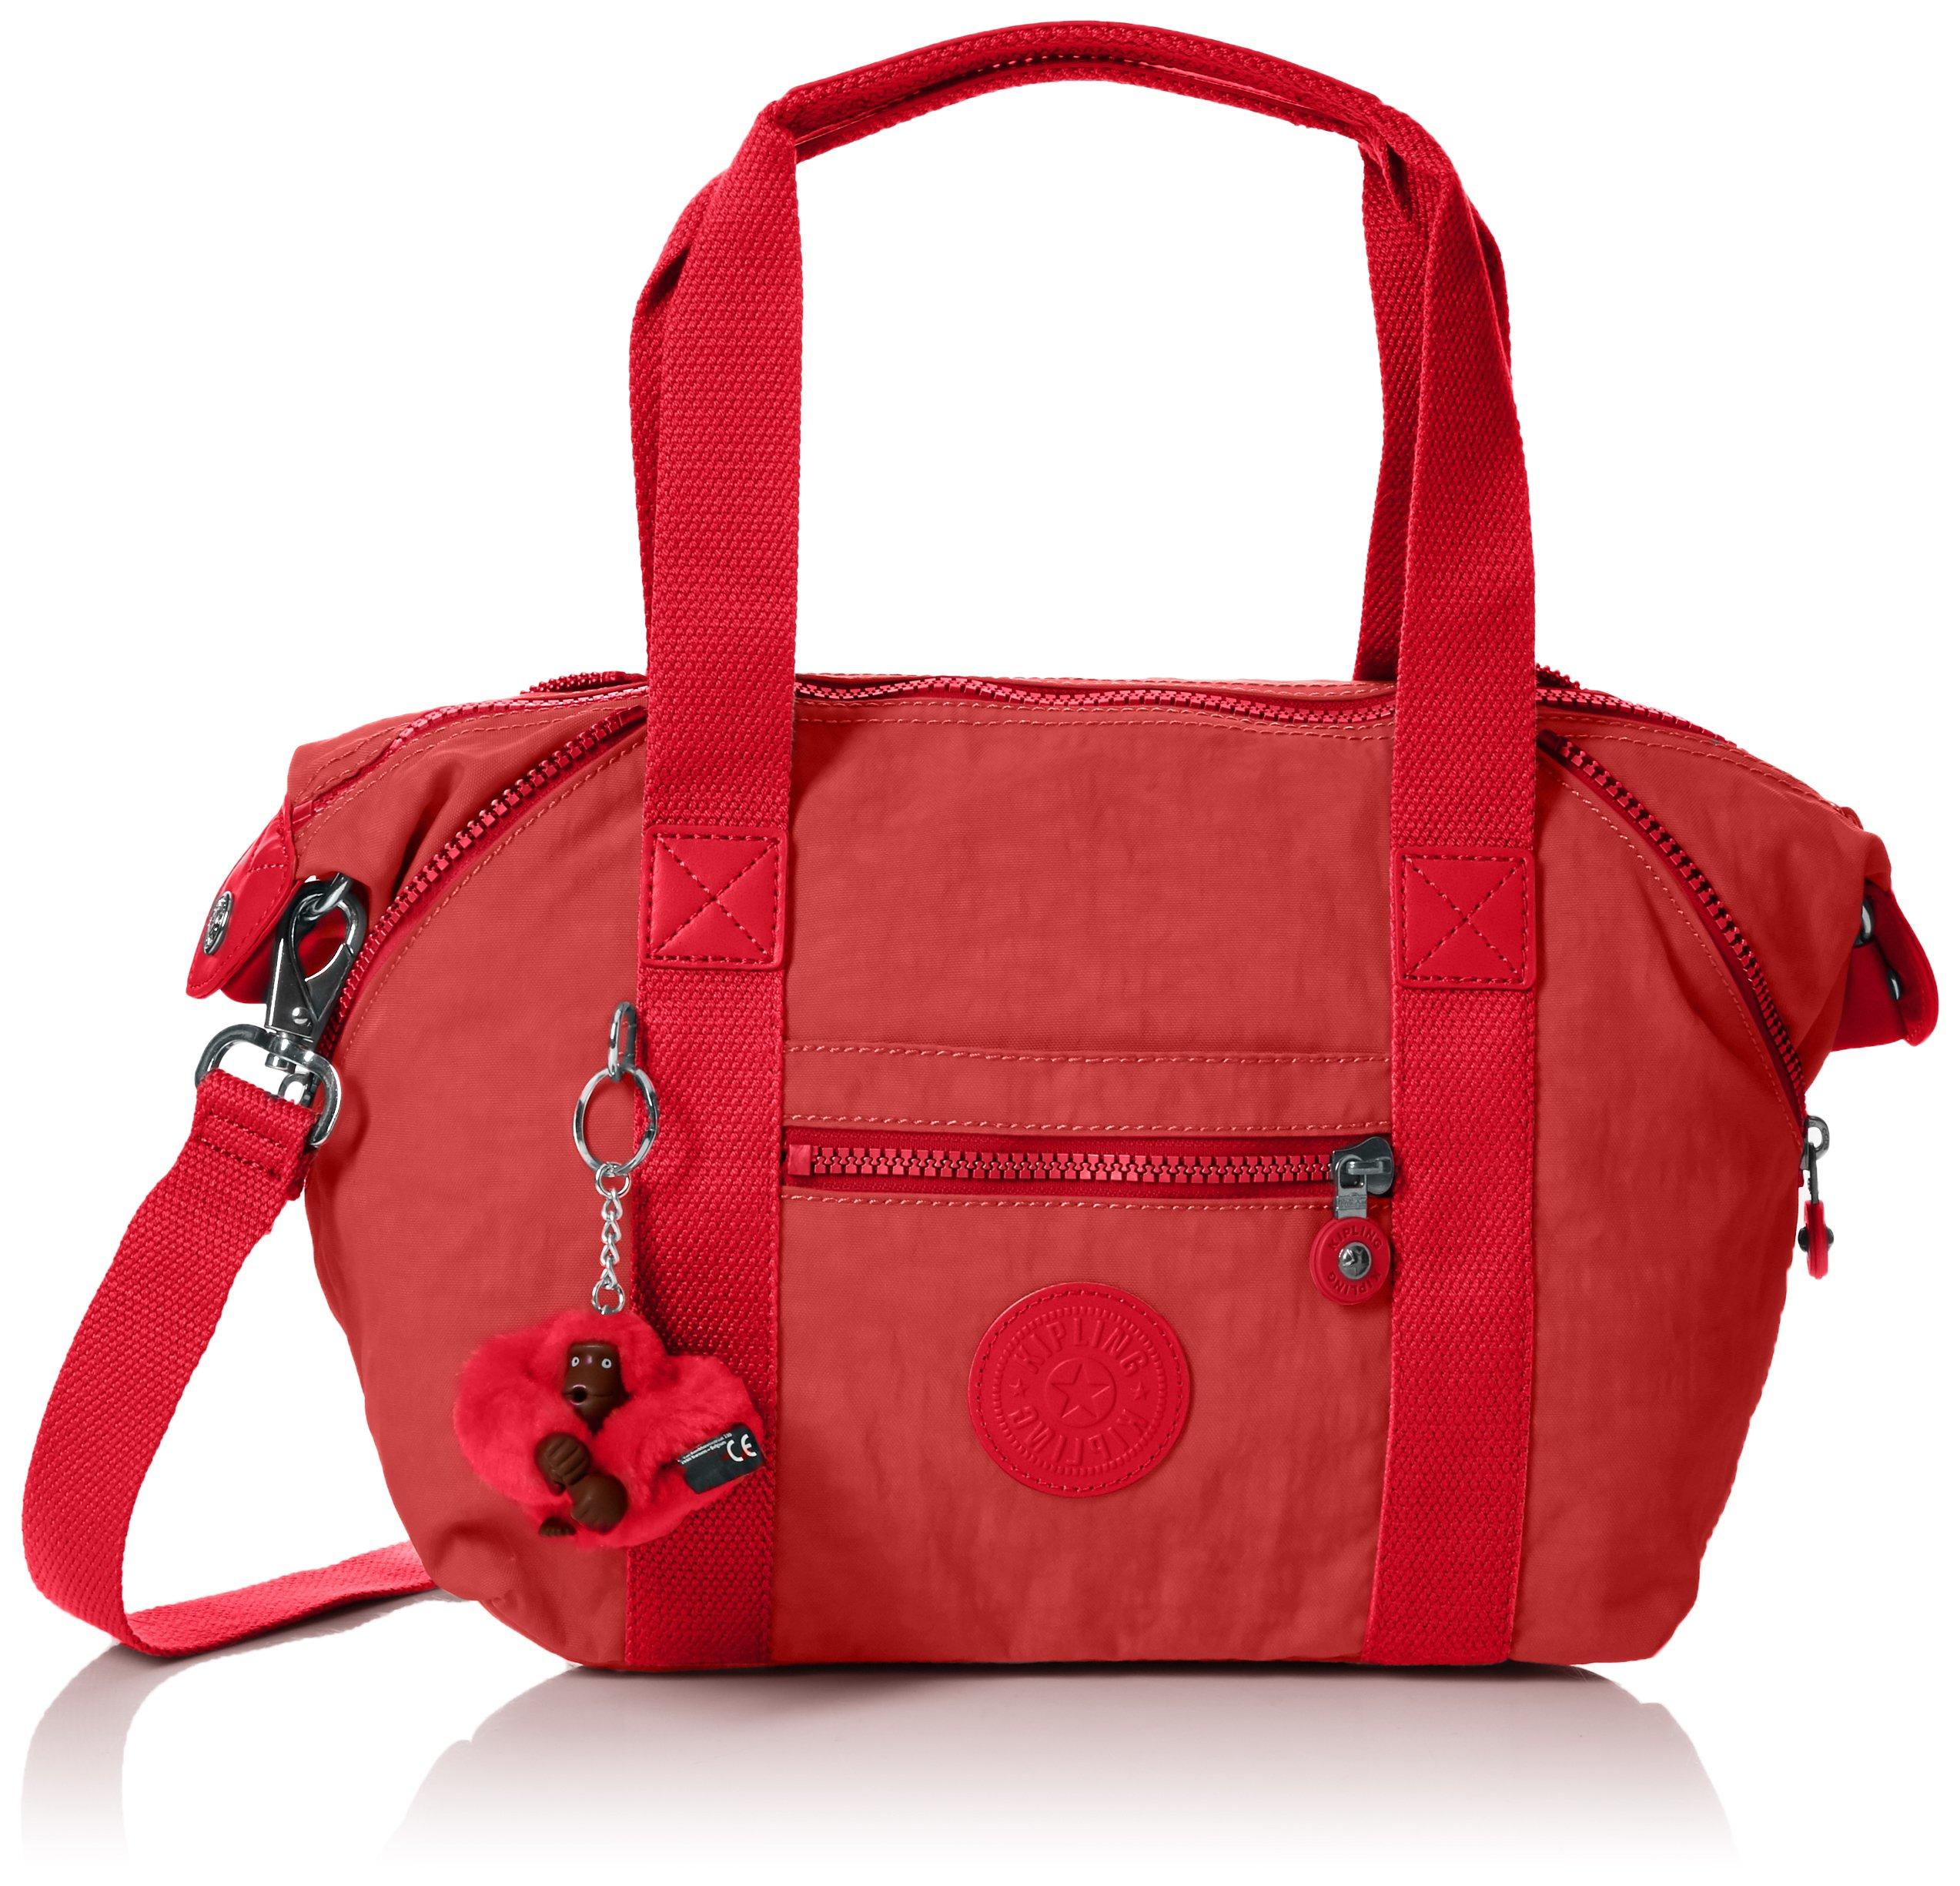 Cmb 5 Red Art MiniCartables FemmeRotspicy H X Kipling C34x21x18 T 08OkwXnP